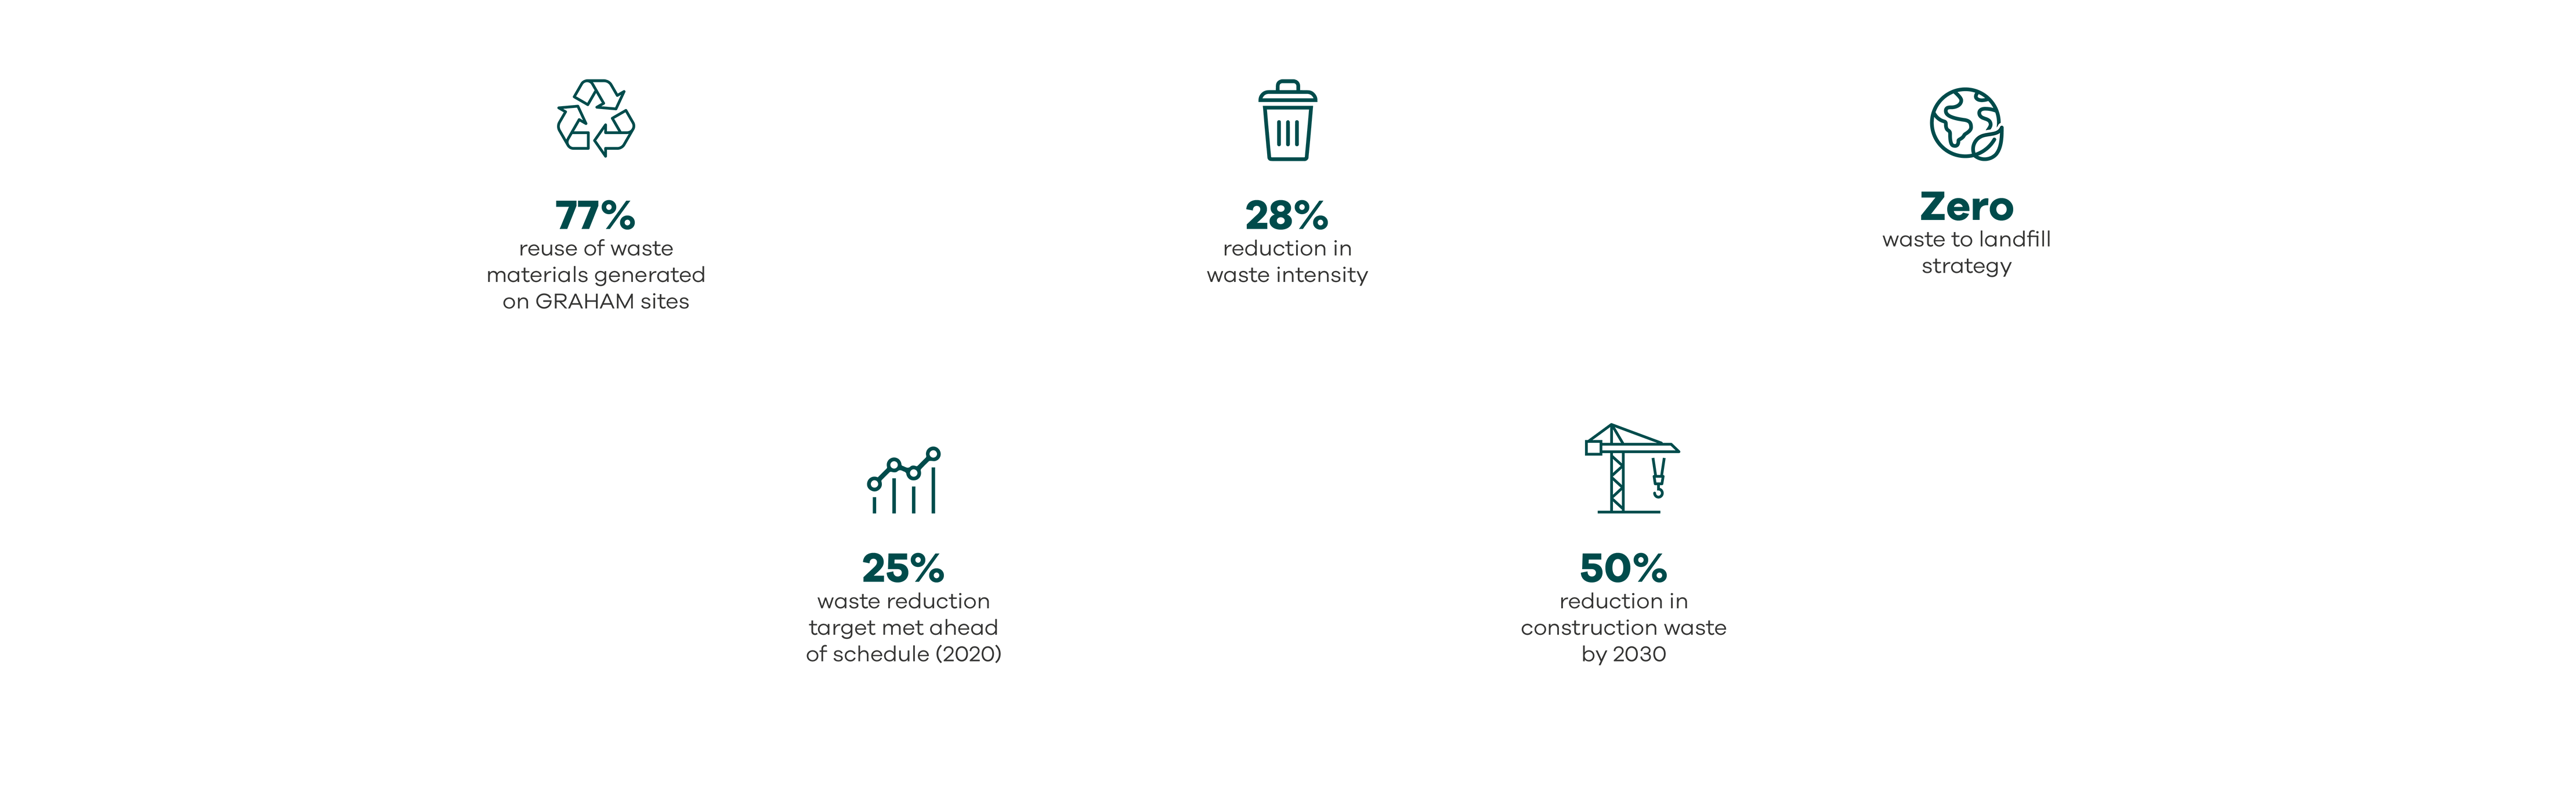 6 UN Goals Responsible Consumption and Production